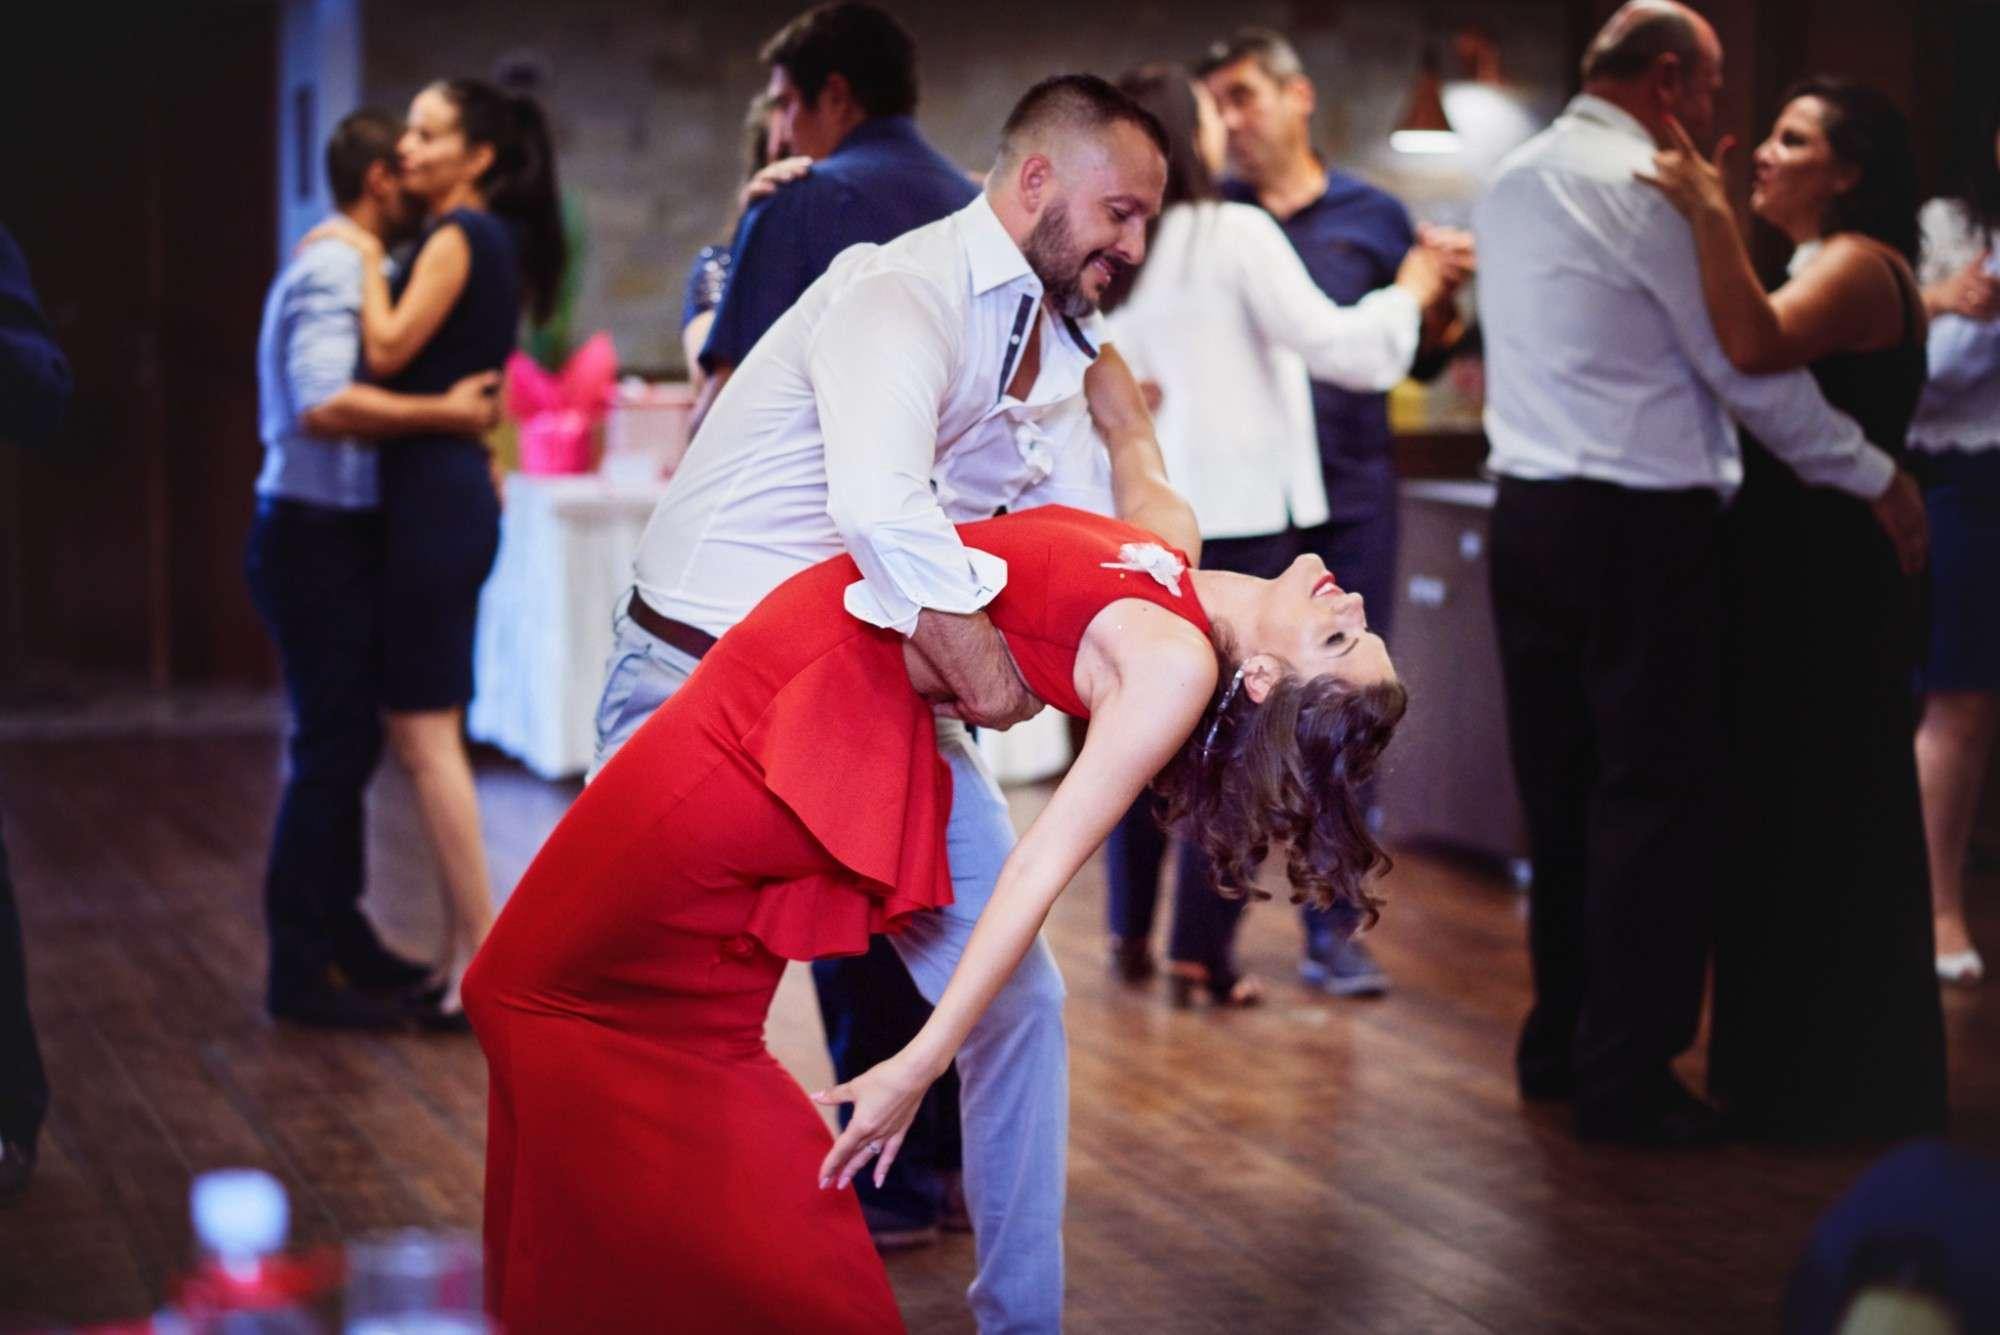 - A group of people walking on the floor - Ballroom dance